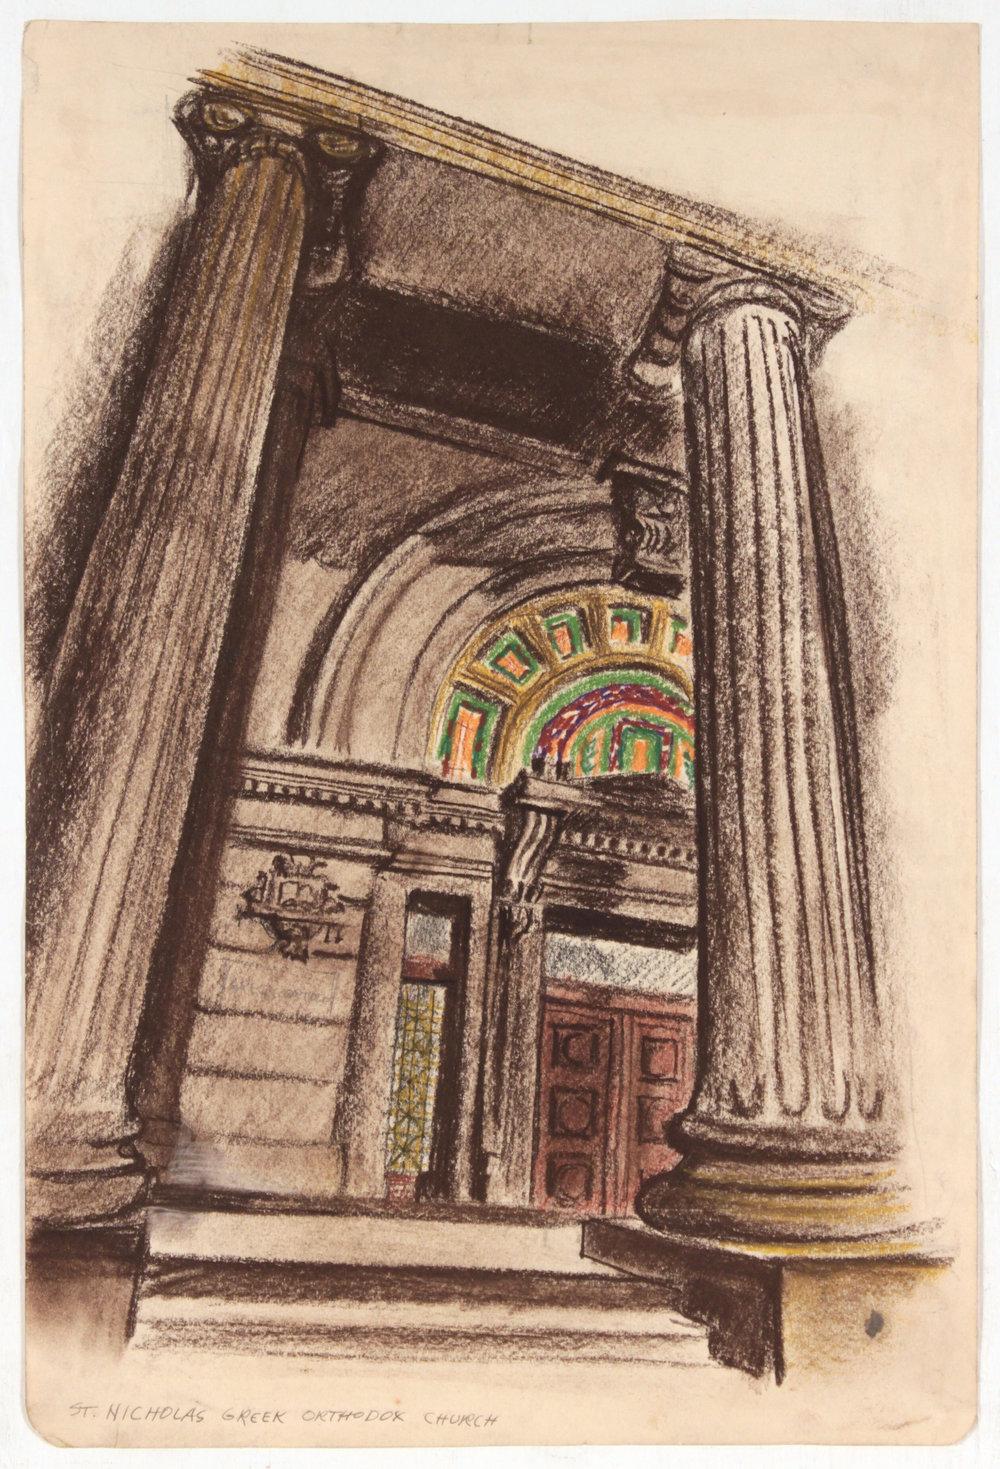 18. 1947-48 c, Image 6_St. Nicholas Greek Orthodox Church, Comté Crayon and Chalk on Paper, 17 5:8x11 3:4, PPS 1417.JPG